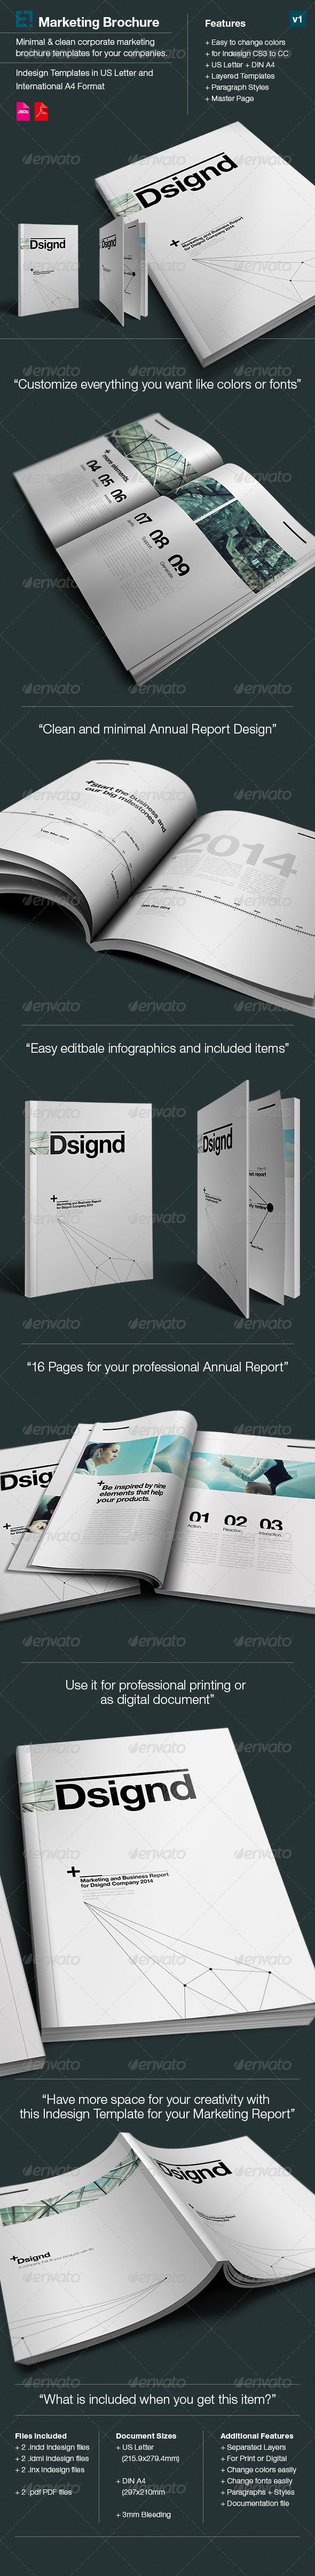 GraphicRiver Suisse Design Marketing Report Dsignd 6458382